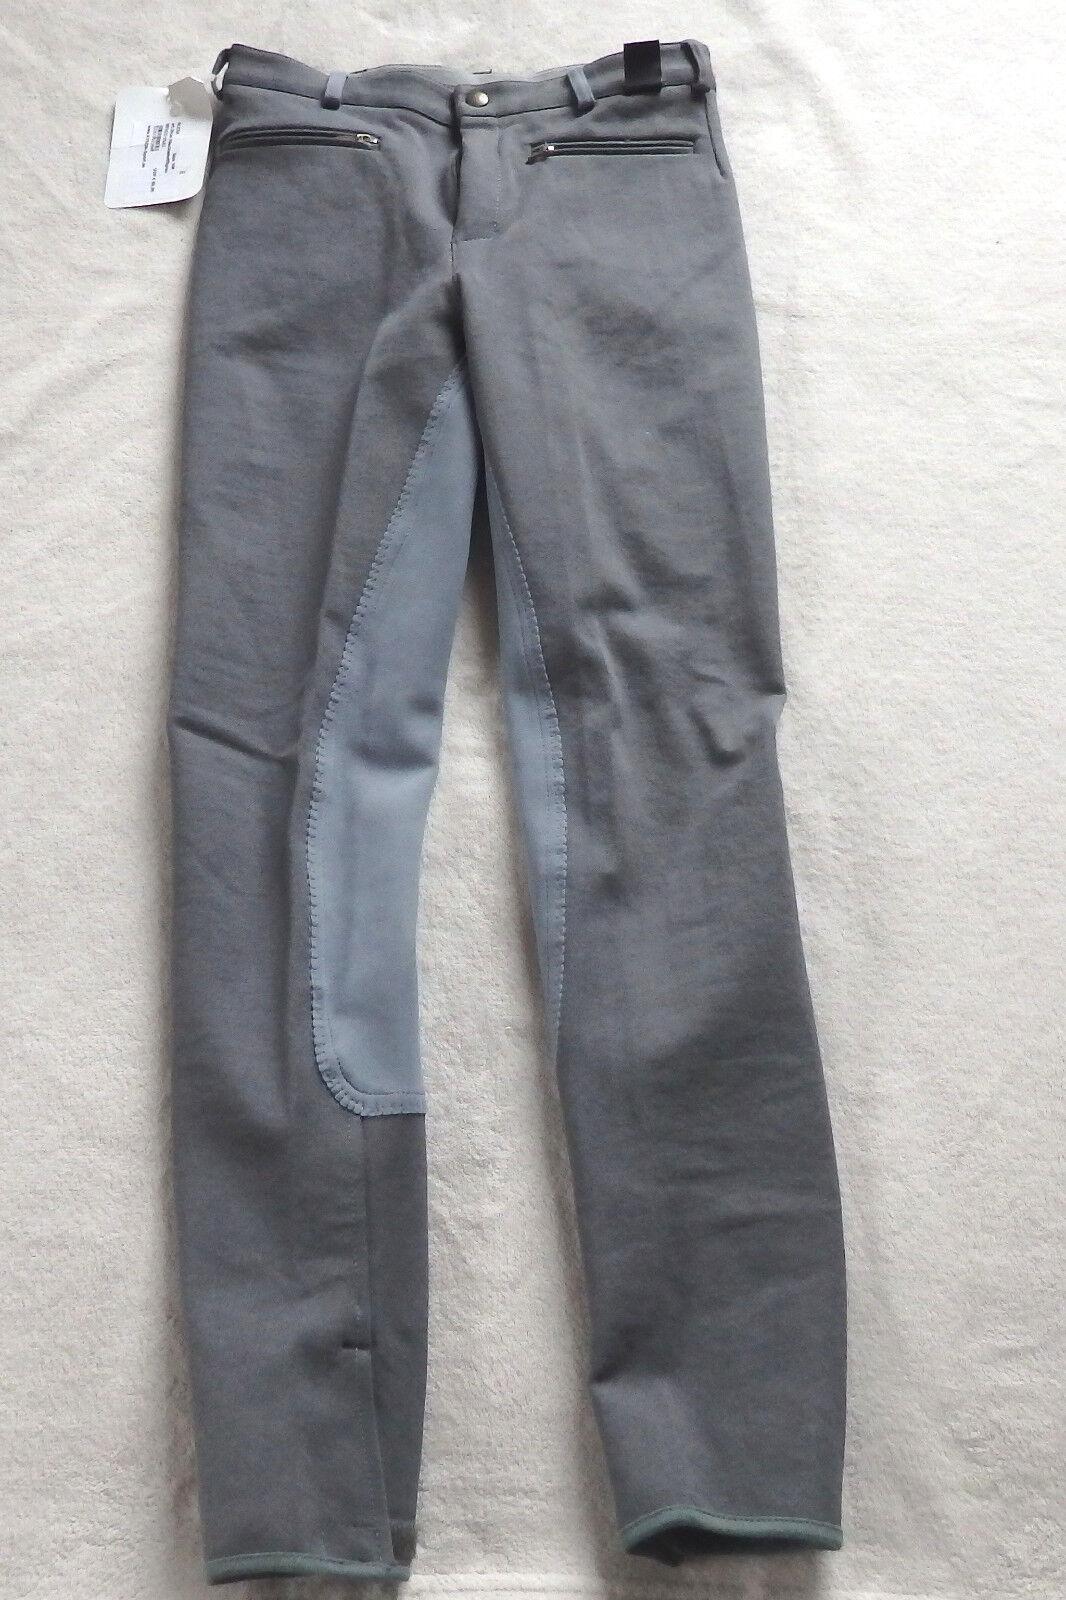 Kyron Kinder Reithose, 3 4 Vollbesatz, grey,Gr 164,  (025)